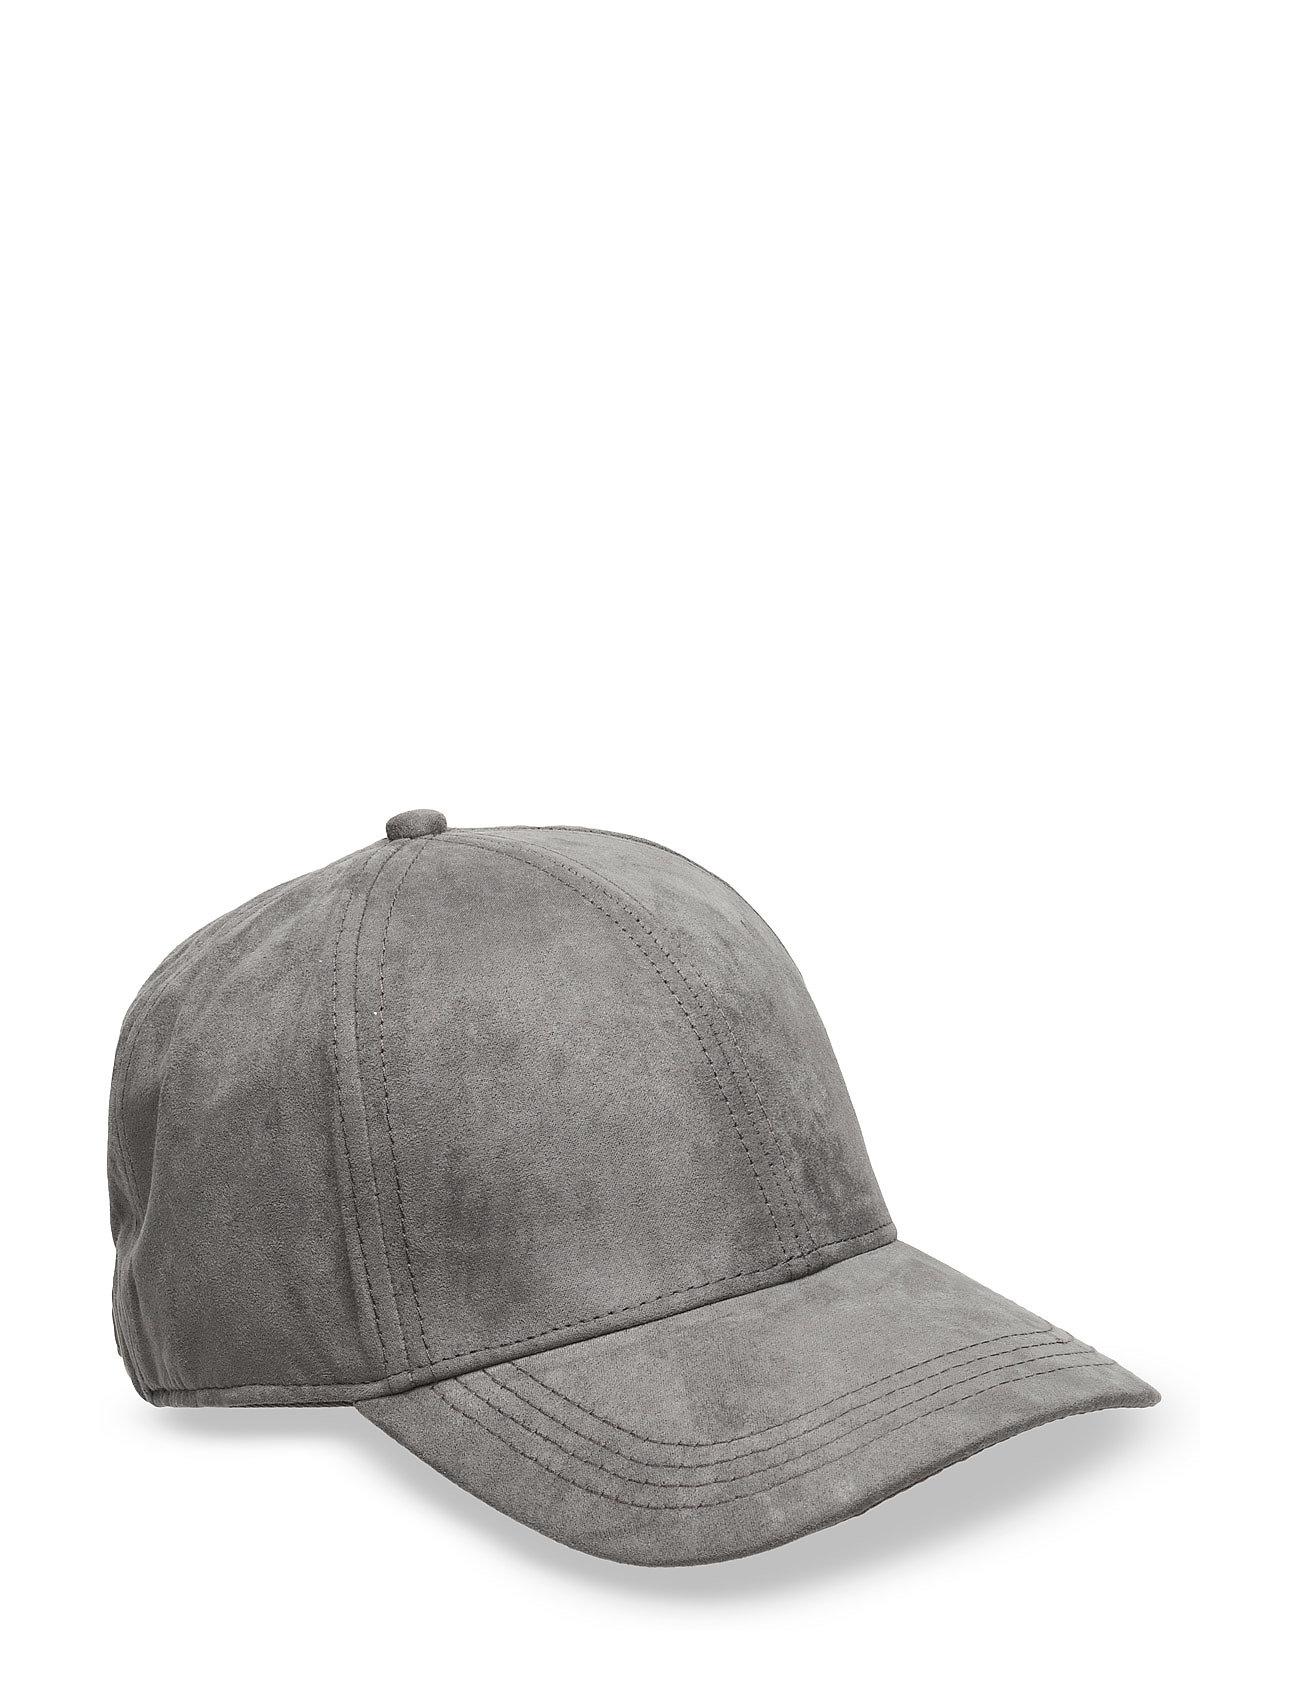 jack & jones premium – Jprsuede baseball cap på boozt.com dk